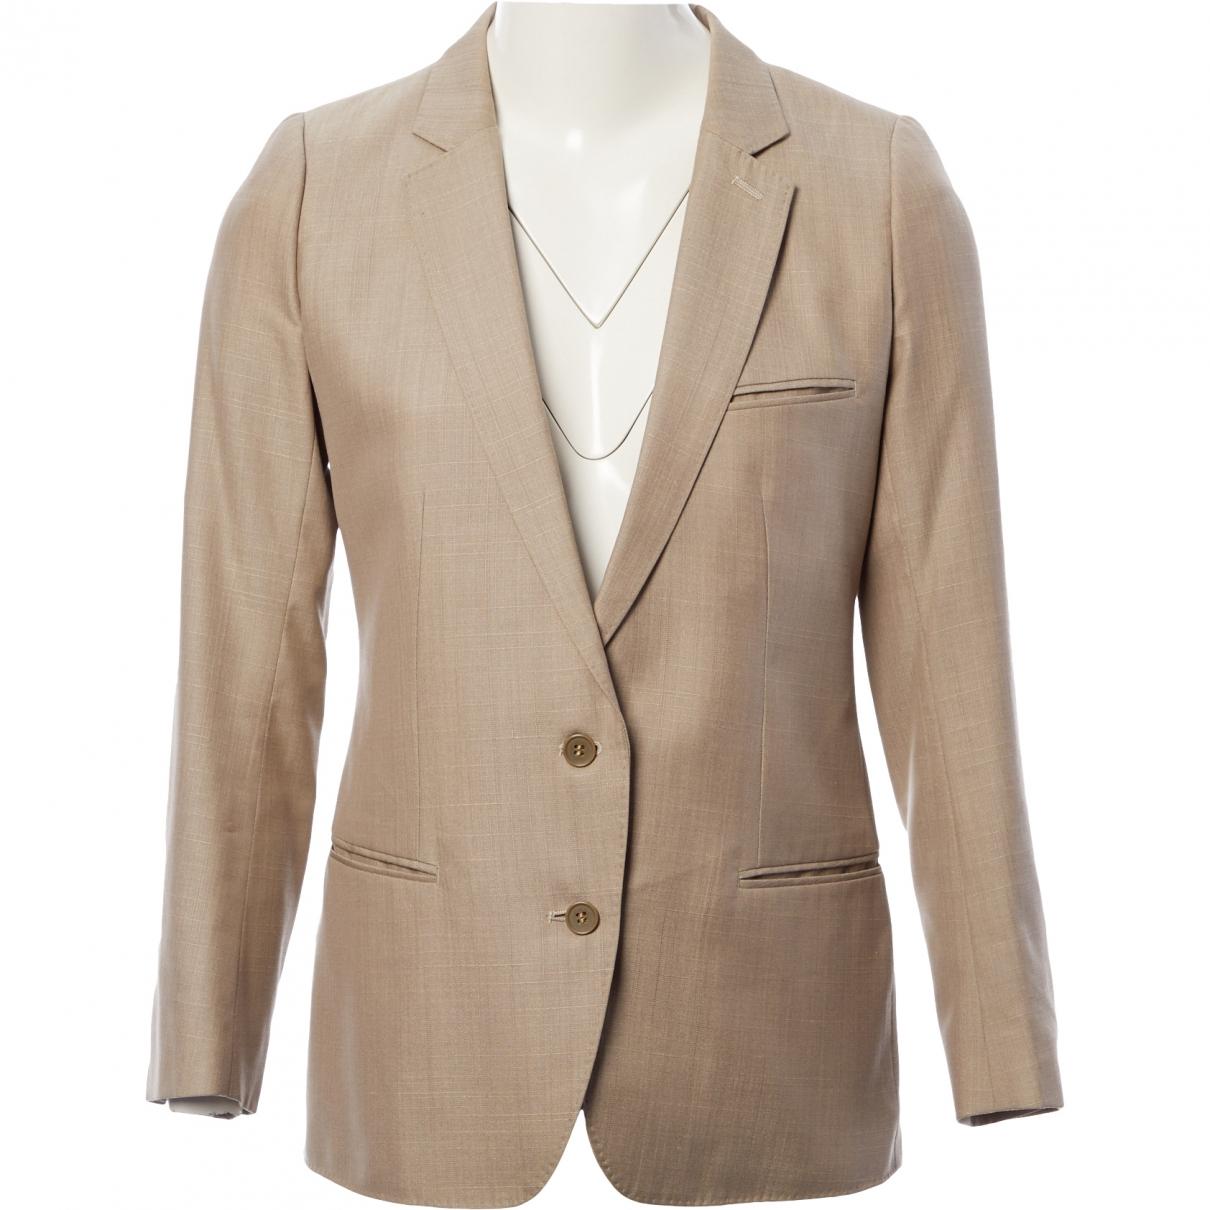 Lemaire \N Beige Silk jacket for Women 3 0-5